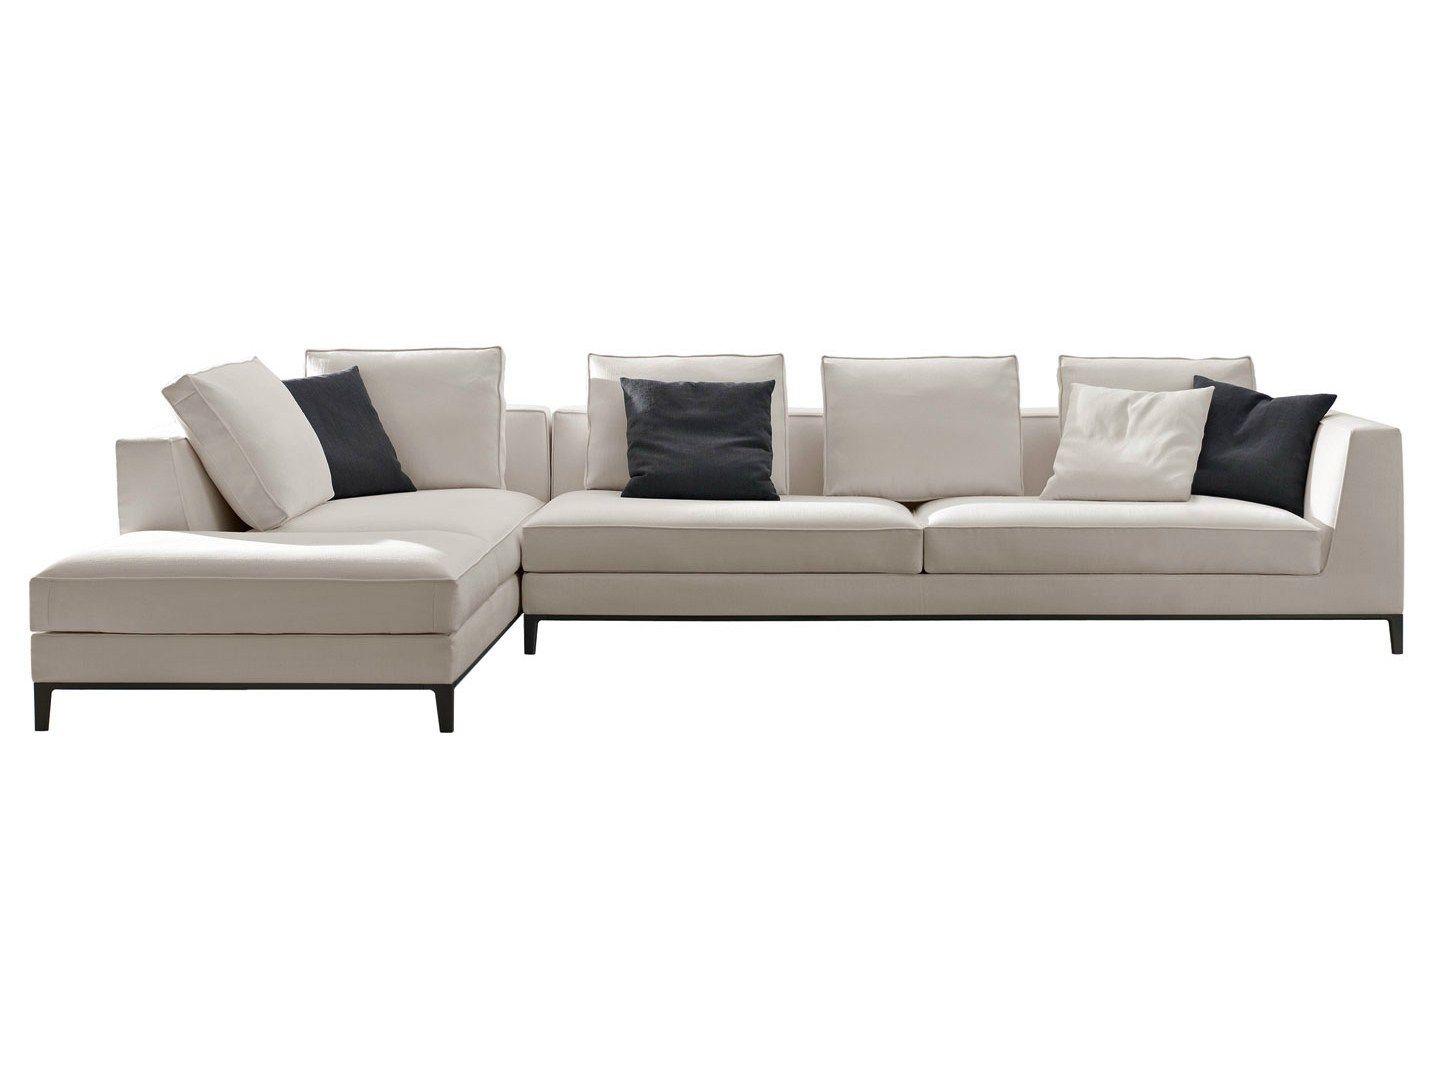 Corner sectional fabric sofa lucrezia by maxalto a brand for B b italia spa